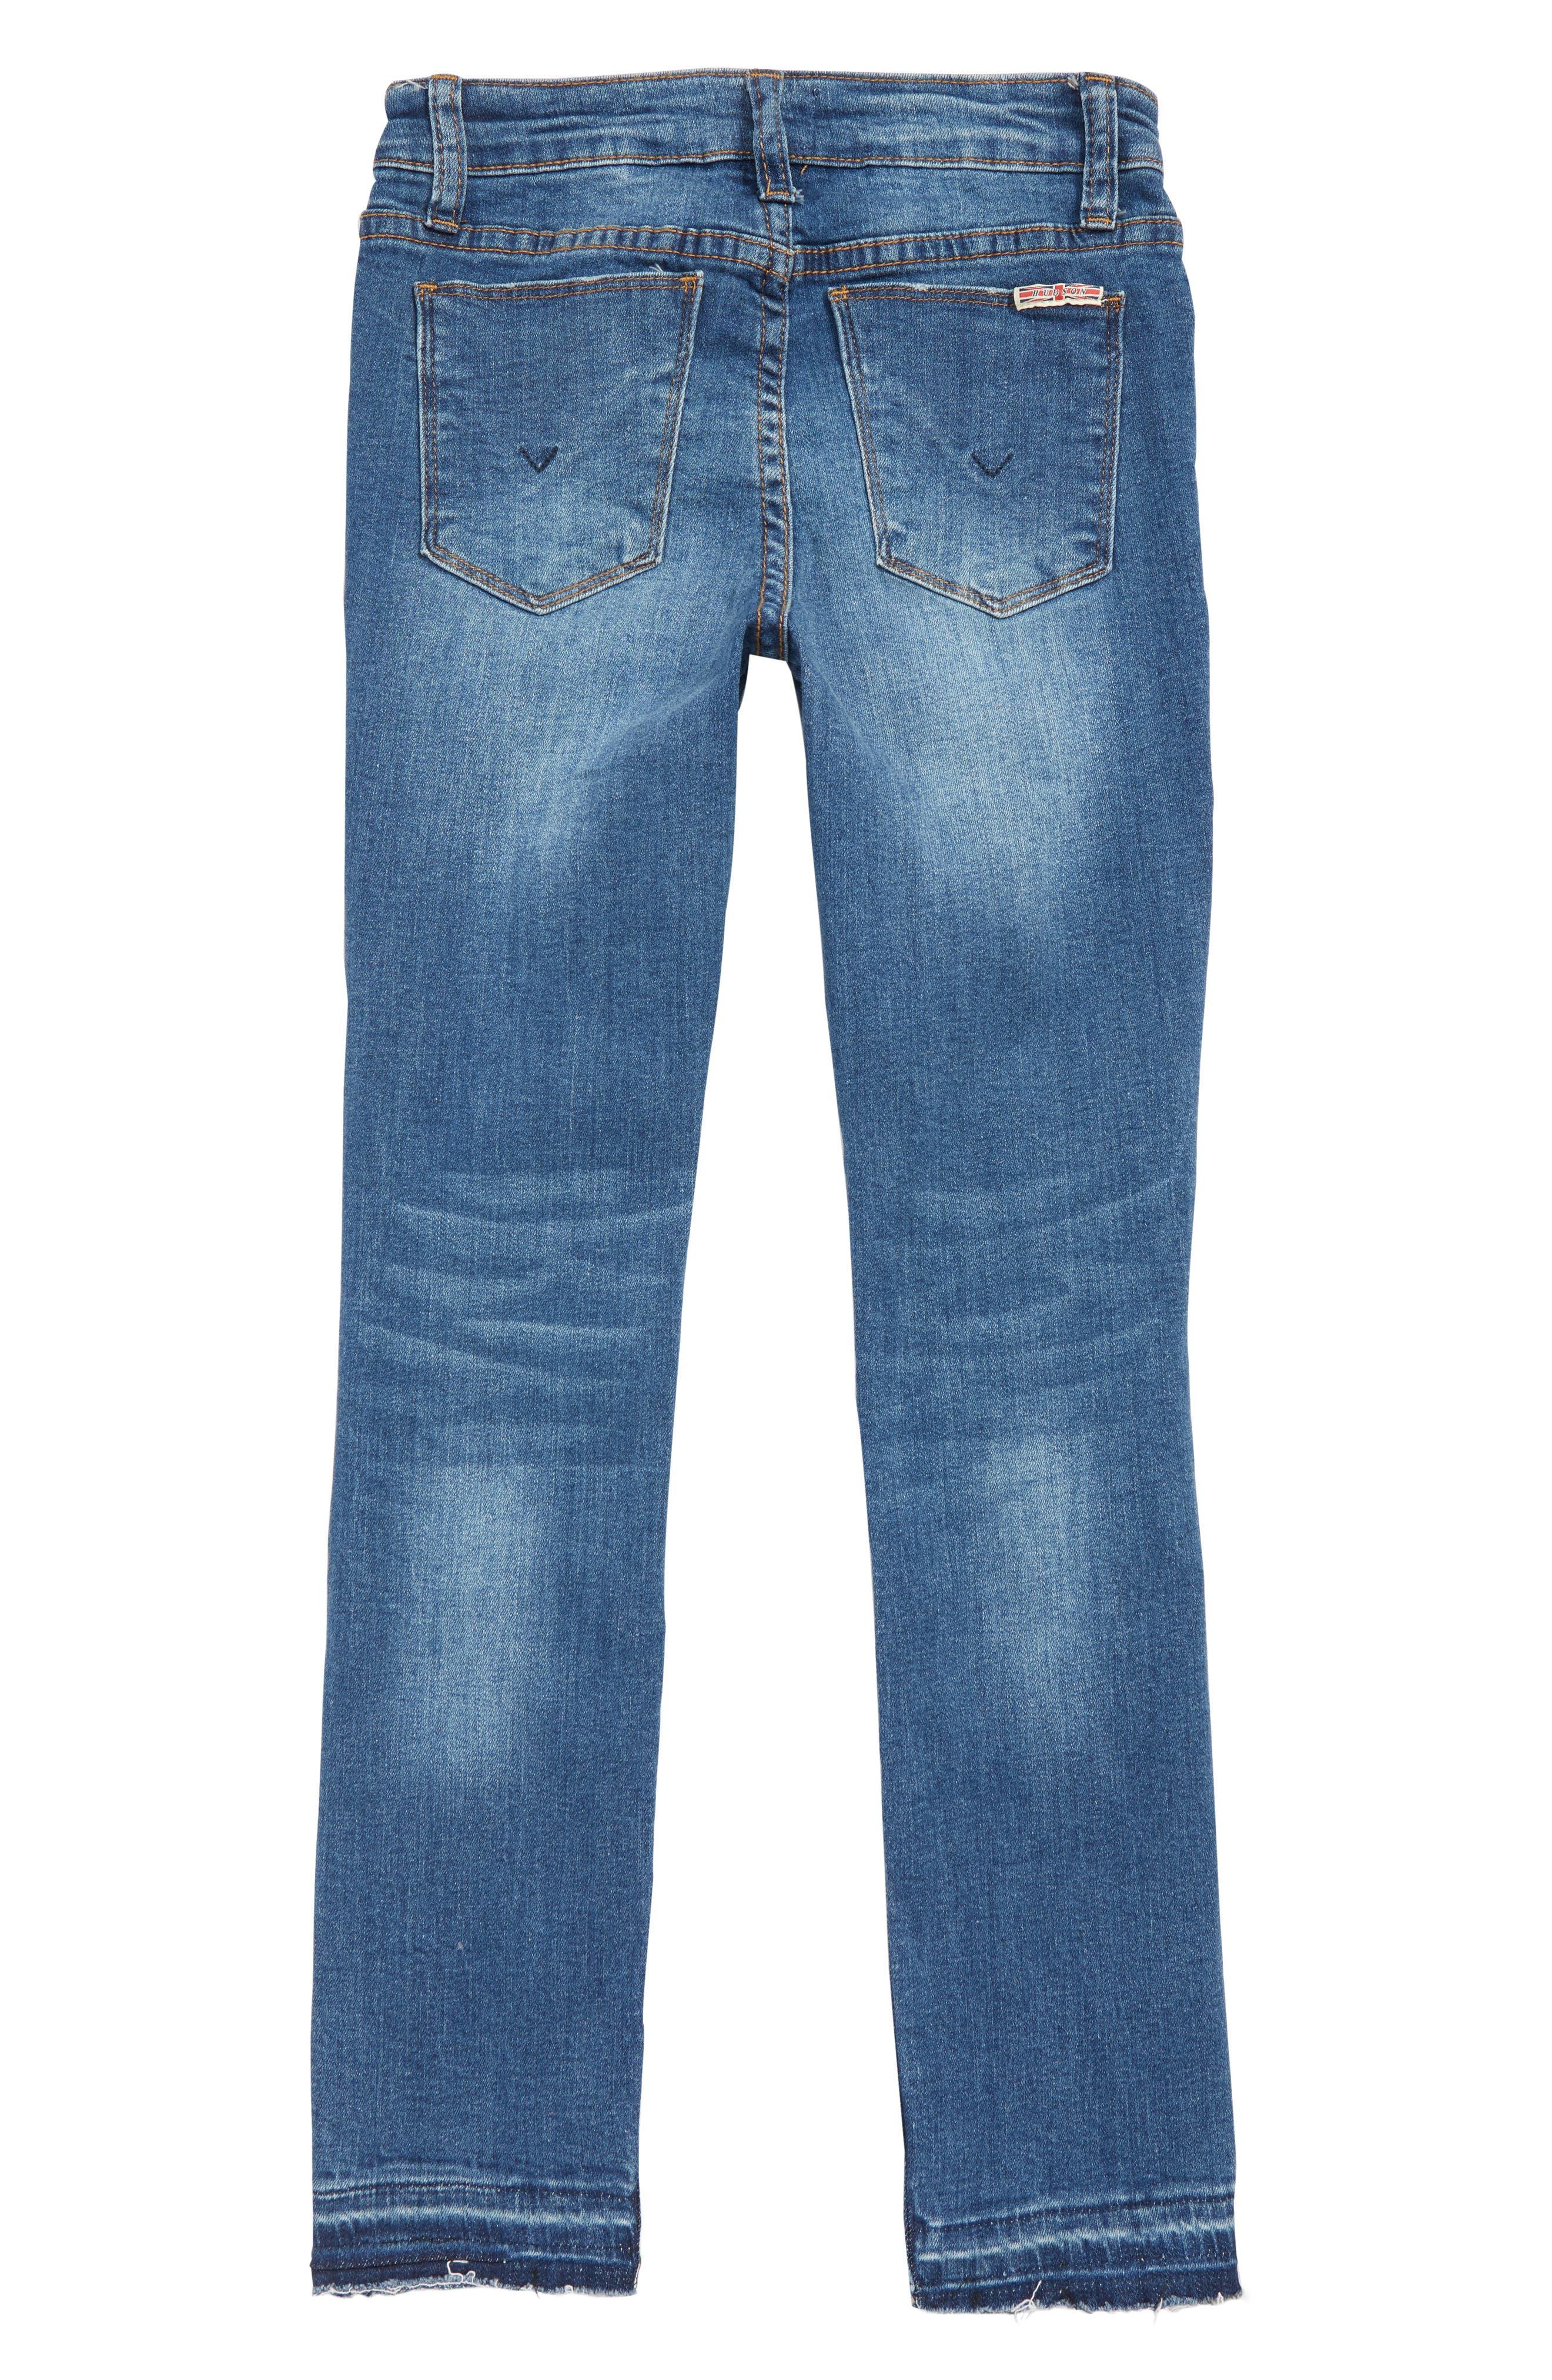 Deja Ripped Crop Jeans,                             Alternate thumbnail 2, color,                             464